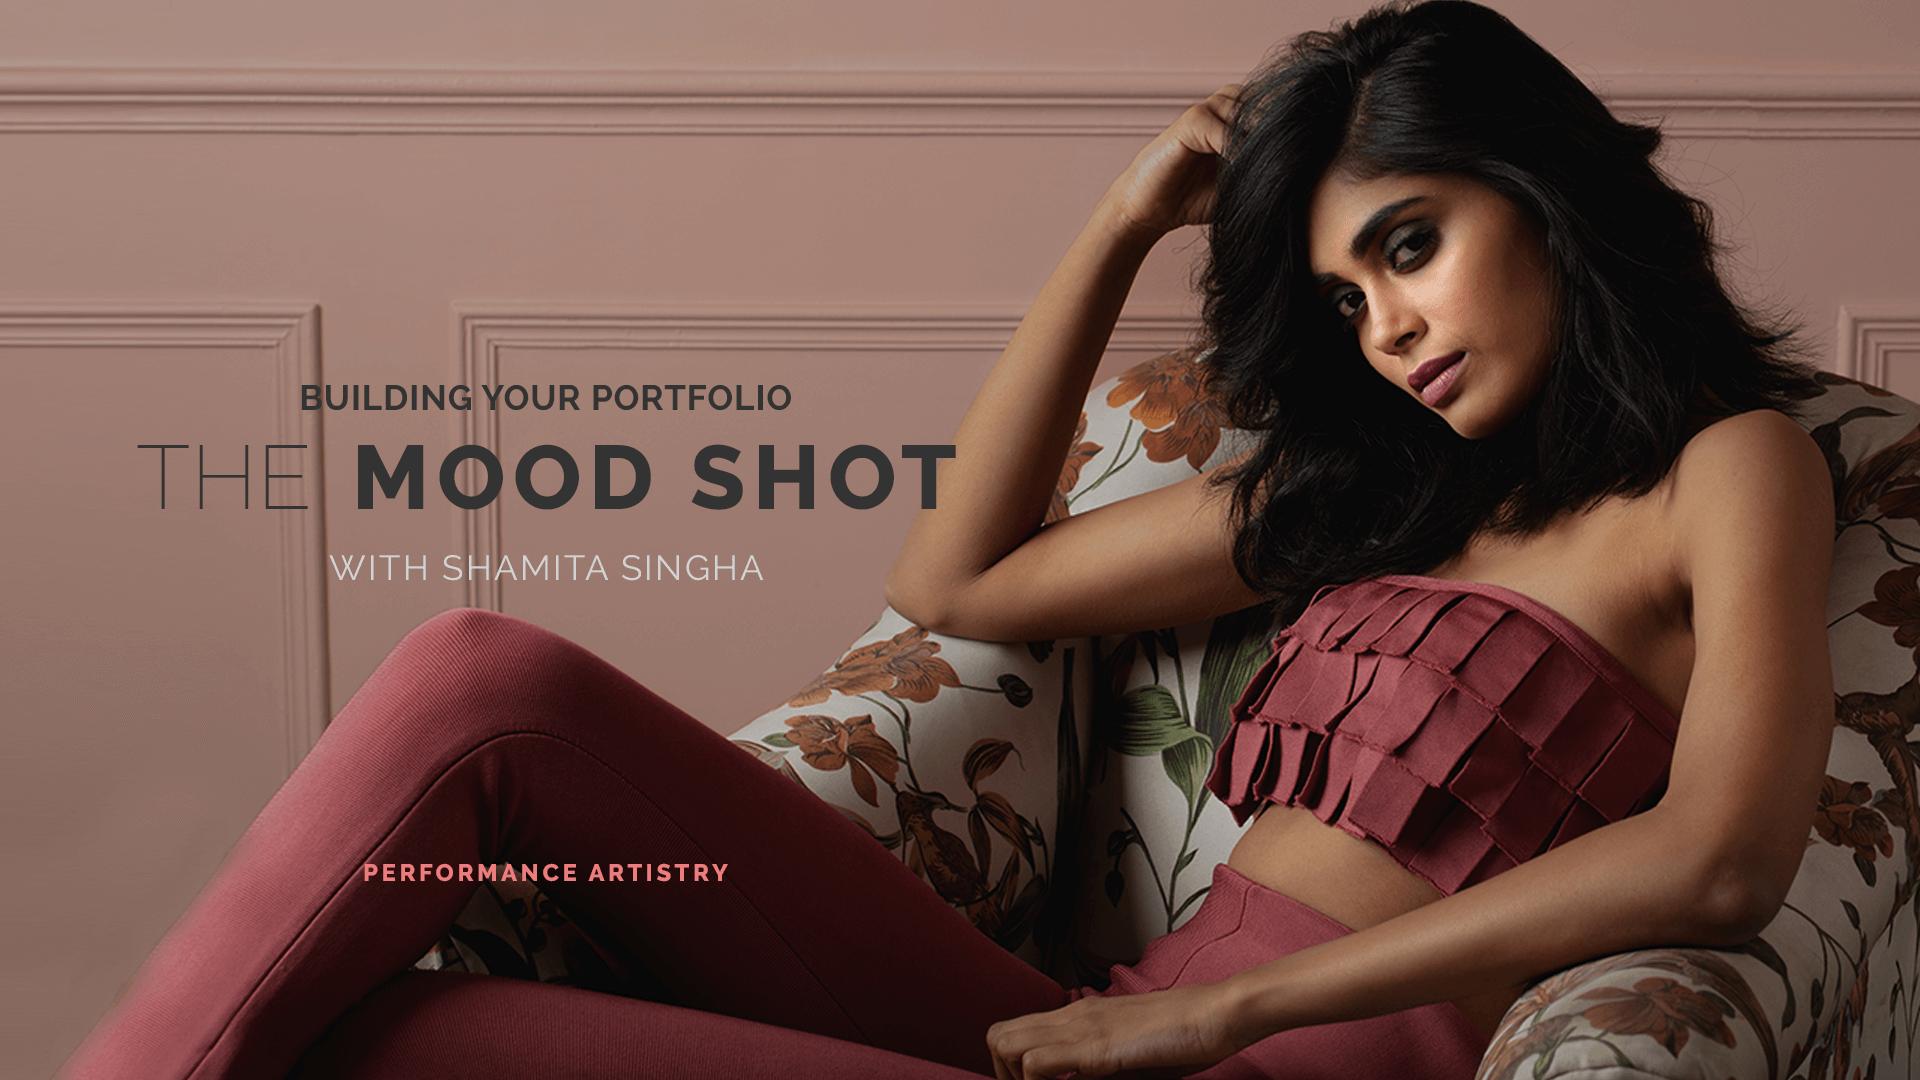 Portfolio Shoot: The Mood Shot